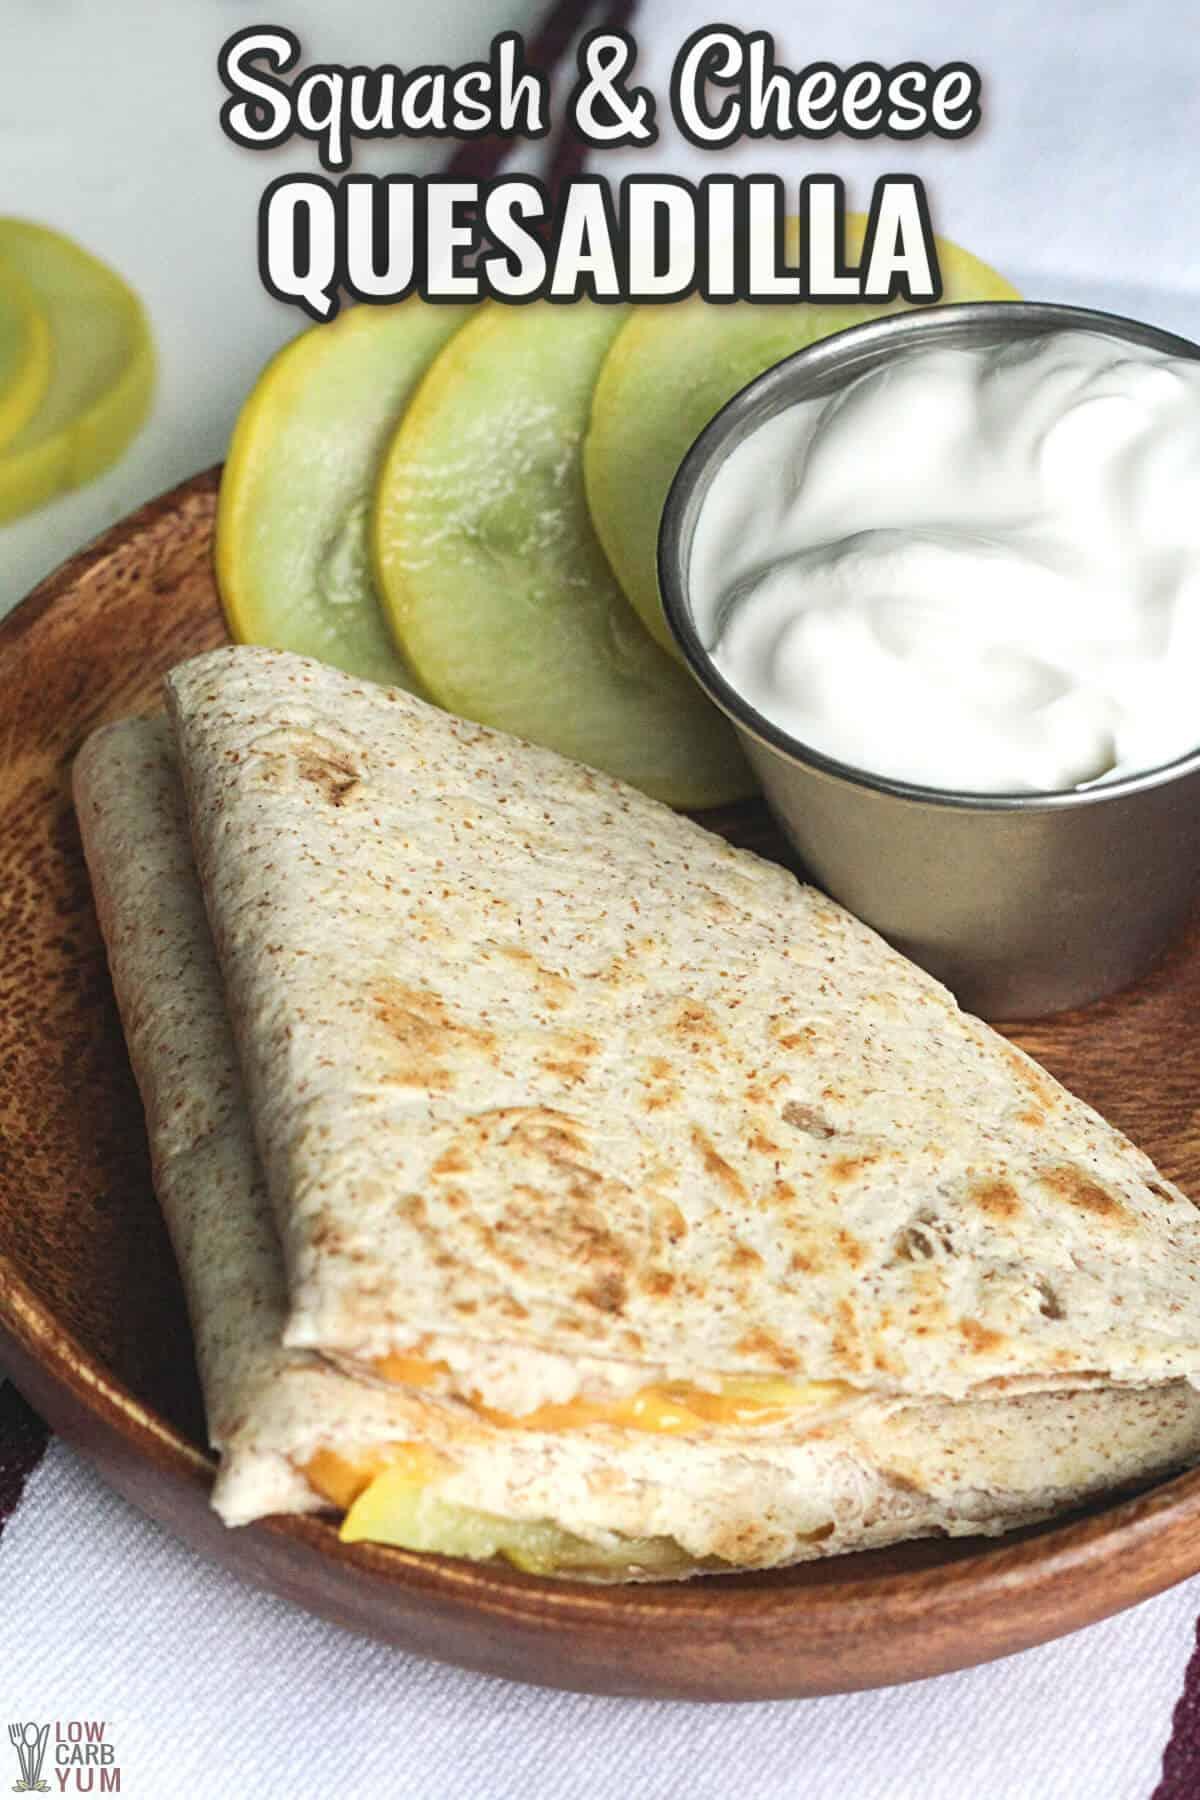 squash cheese quesadilla cover image